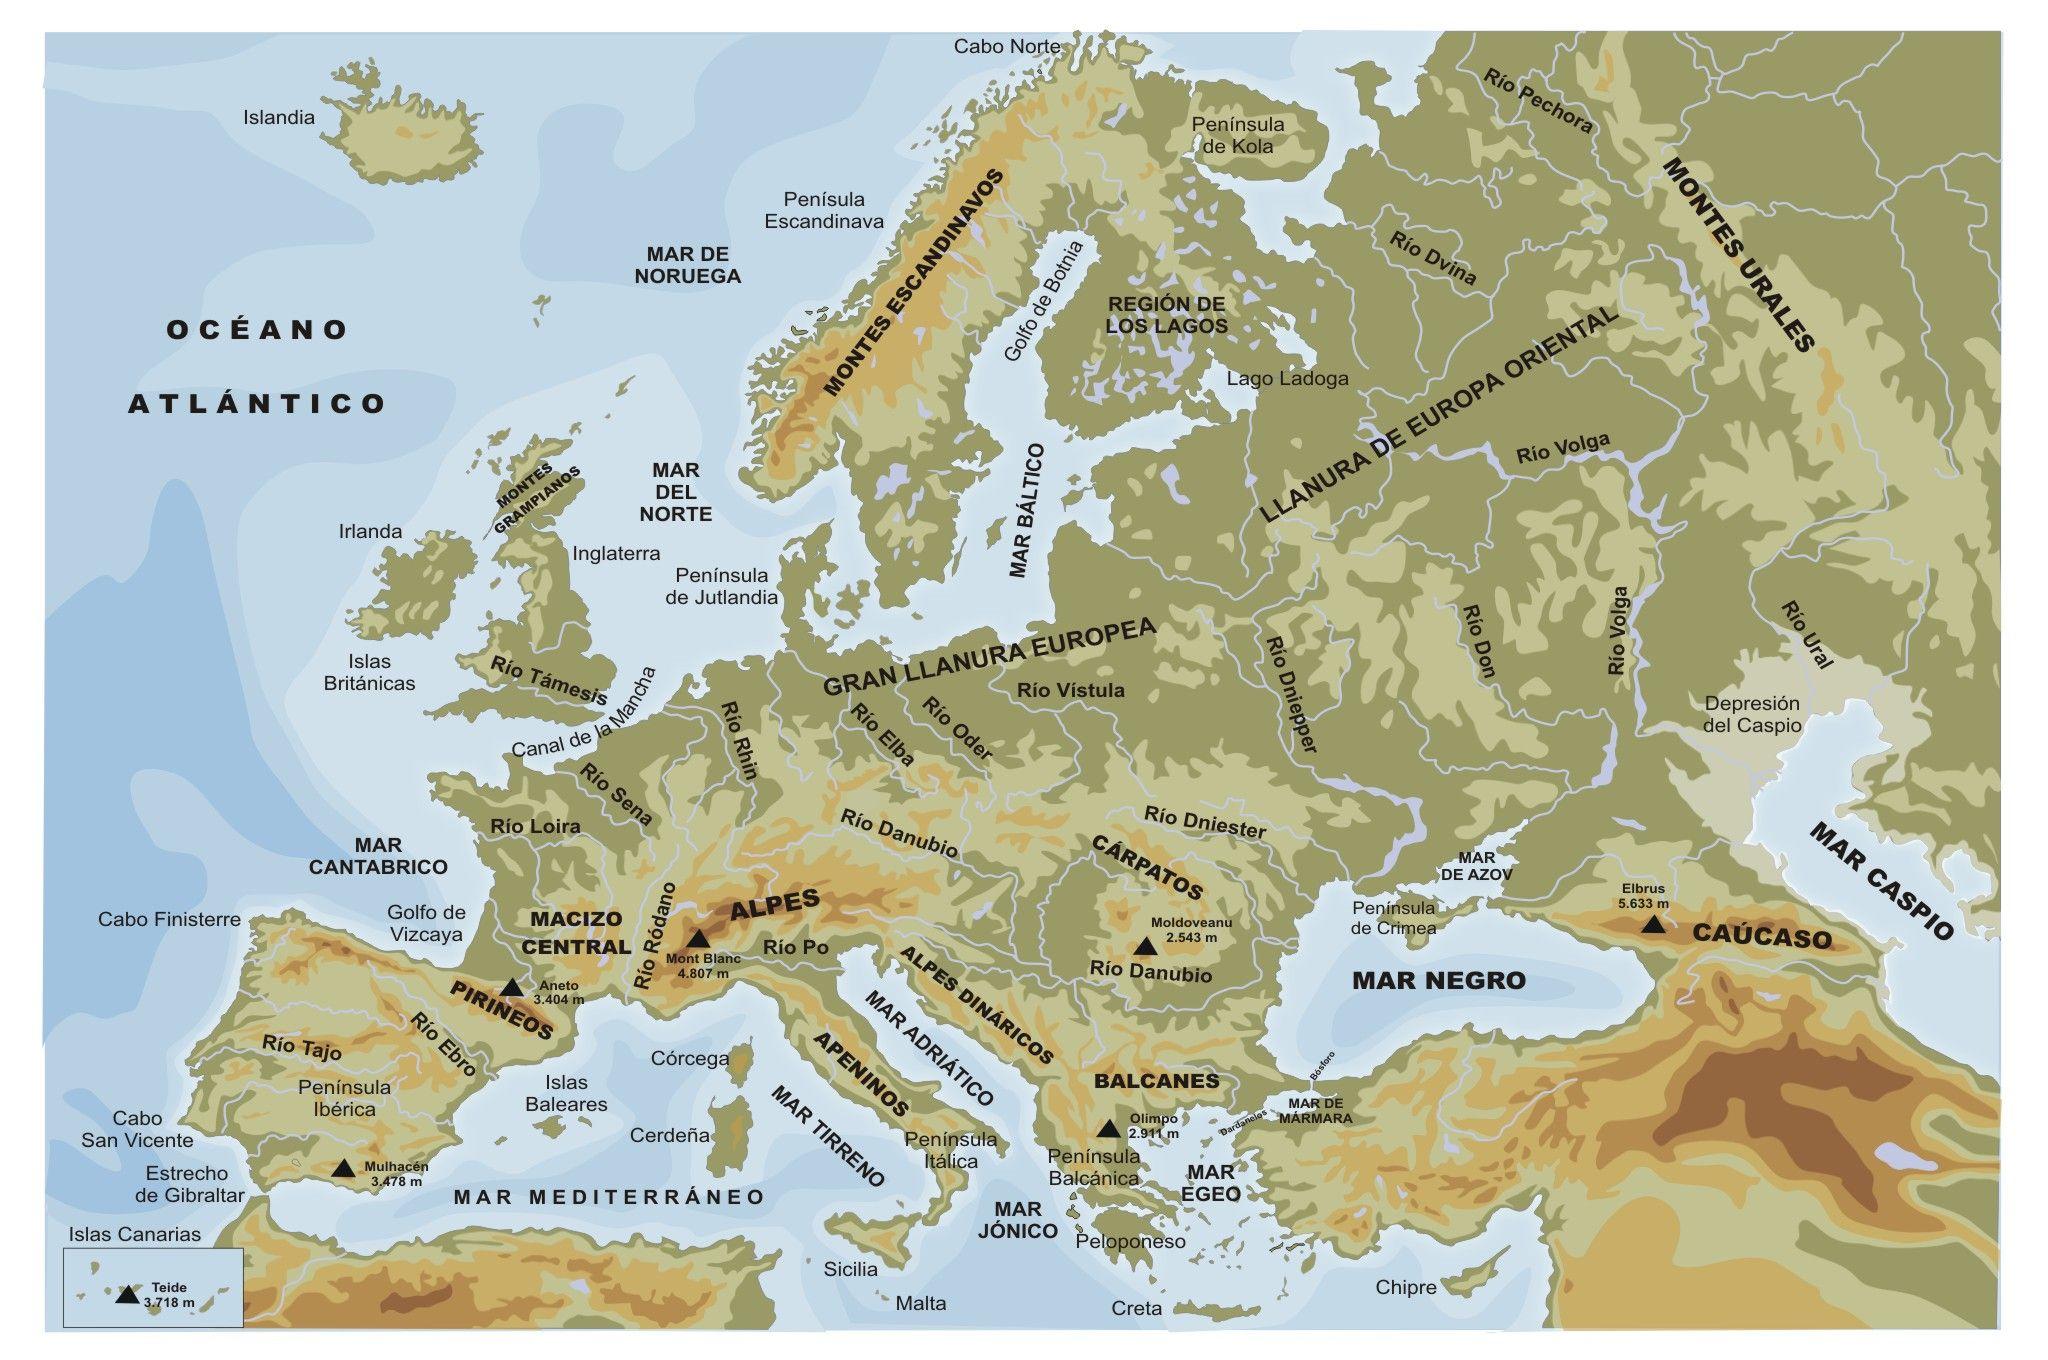 Mapa fsico de Europa httpcontenidoseducarexessama2010